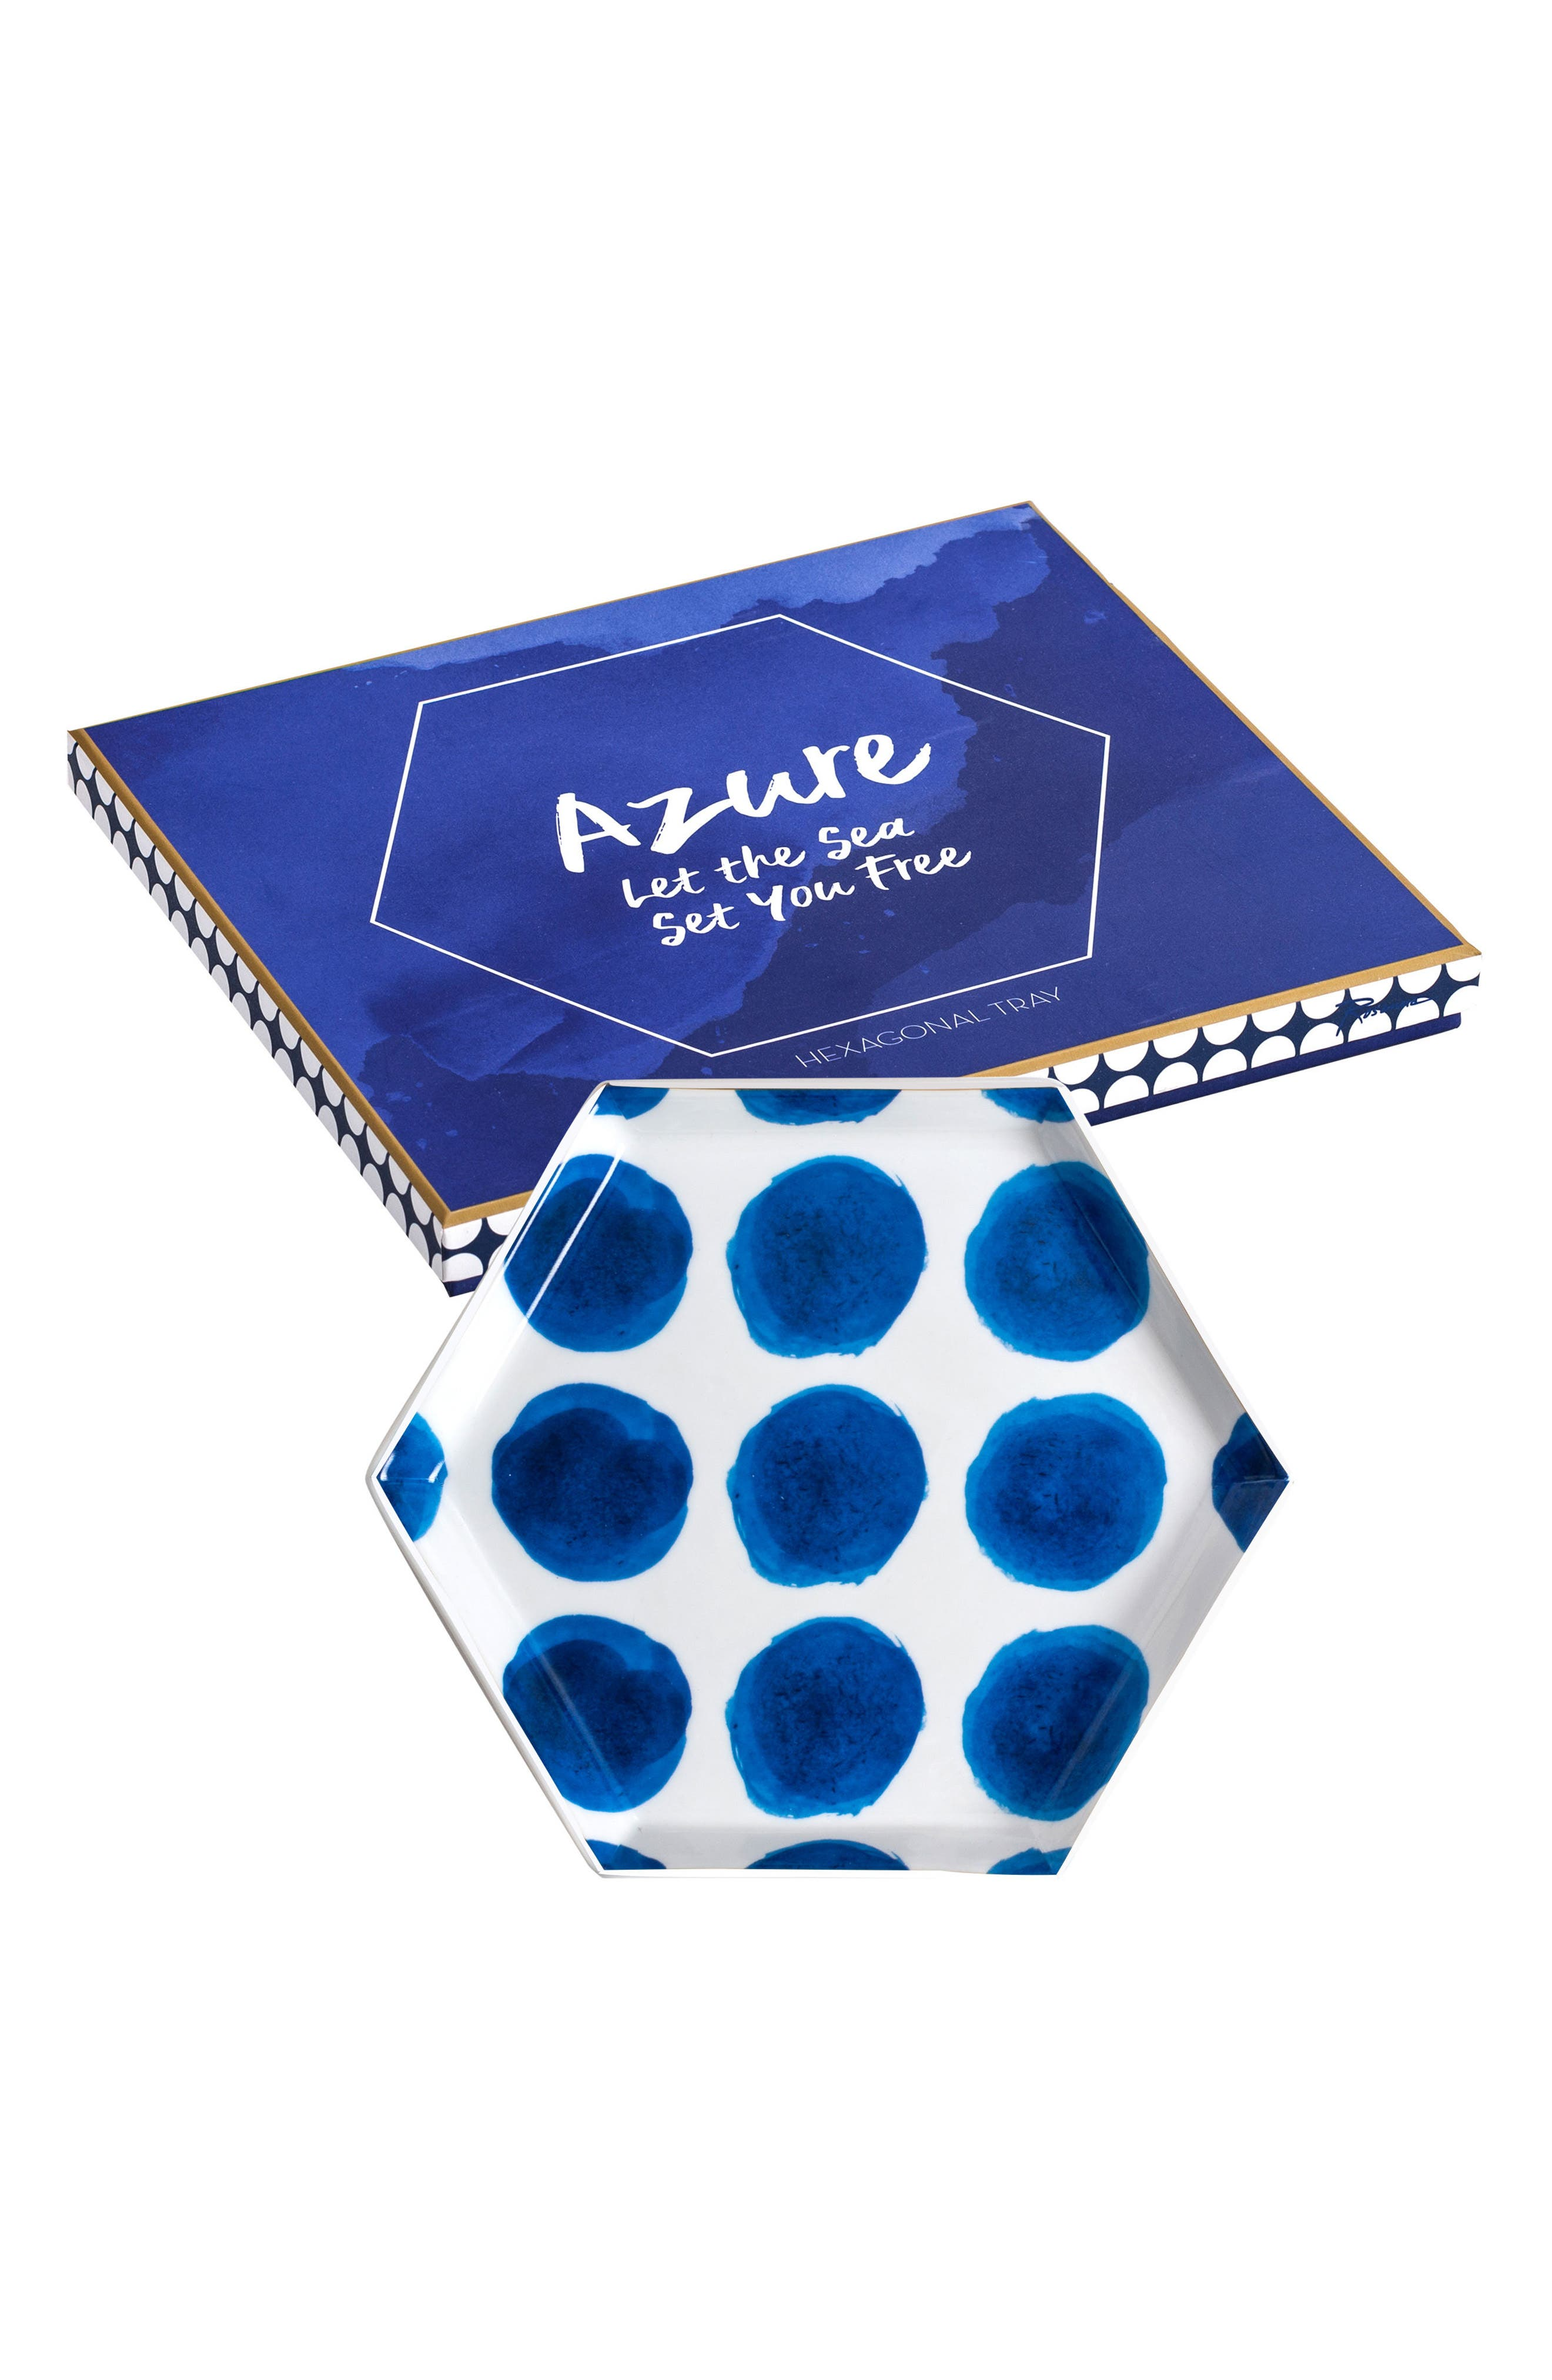 Polka Dot Hexagon Tray,                         Main,                         color, White/ Blue